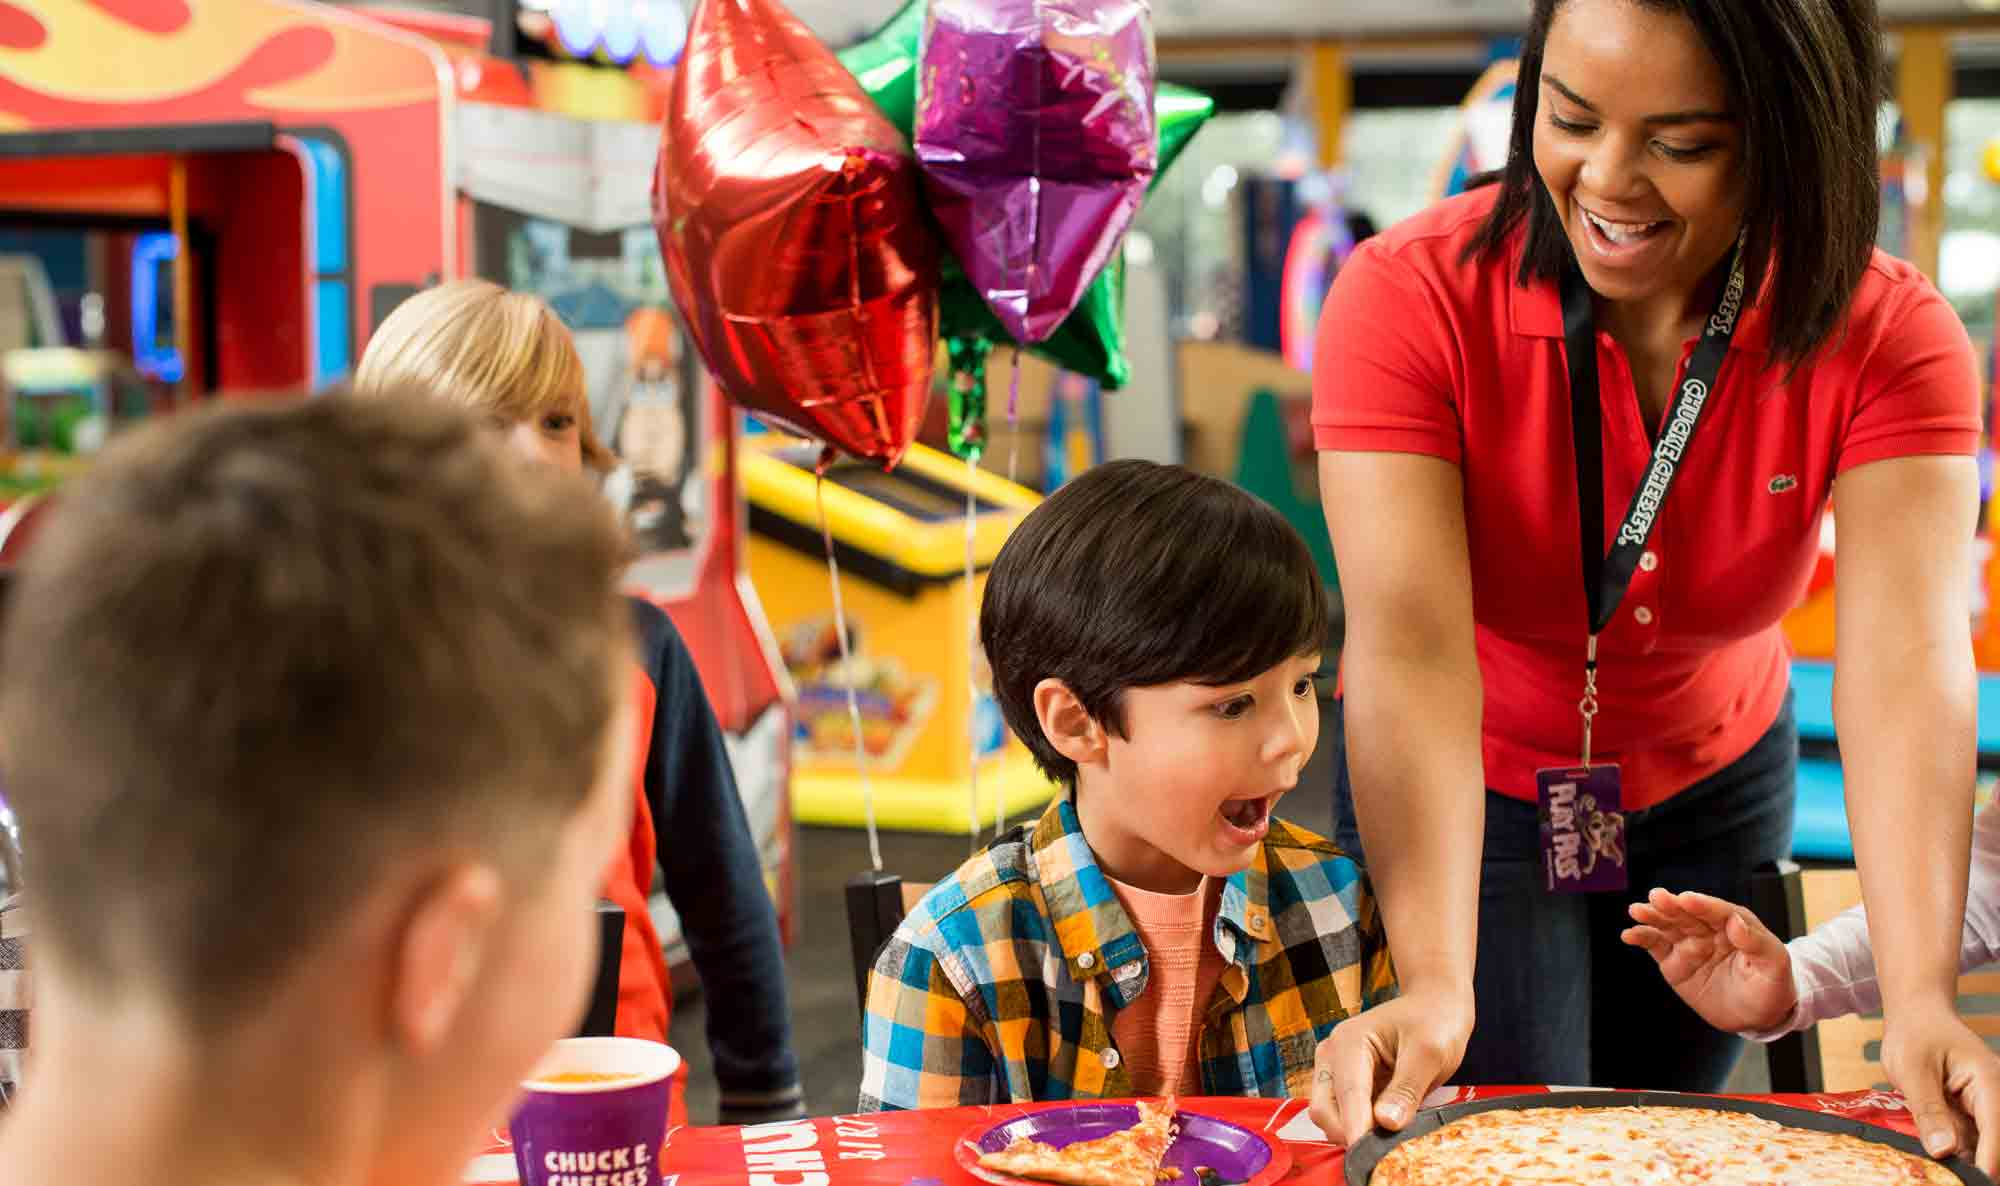 Employee bringing kids pizza